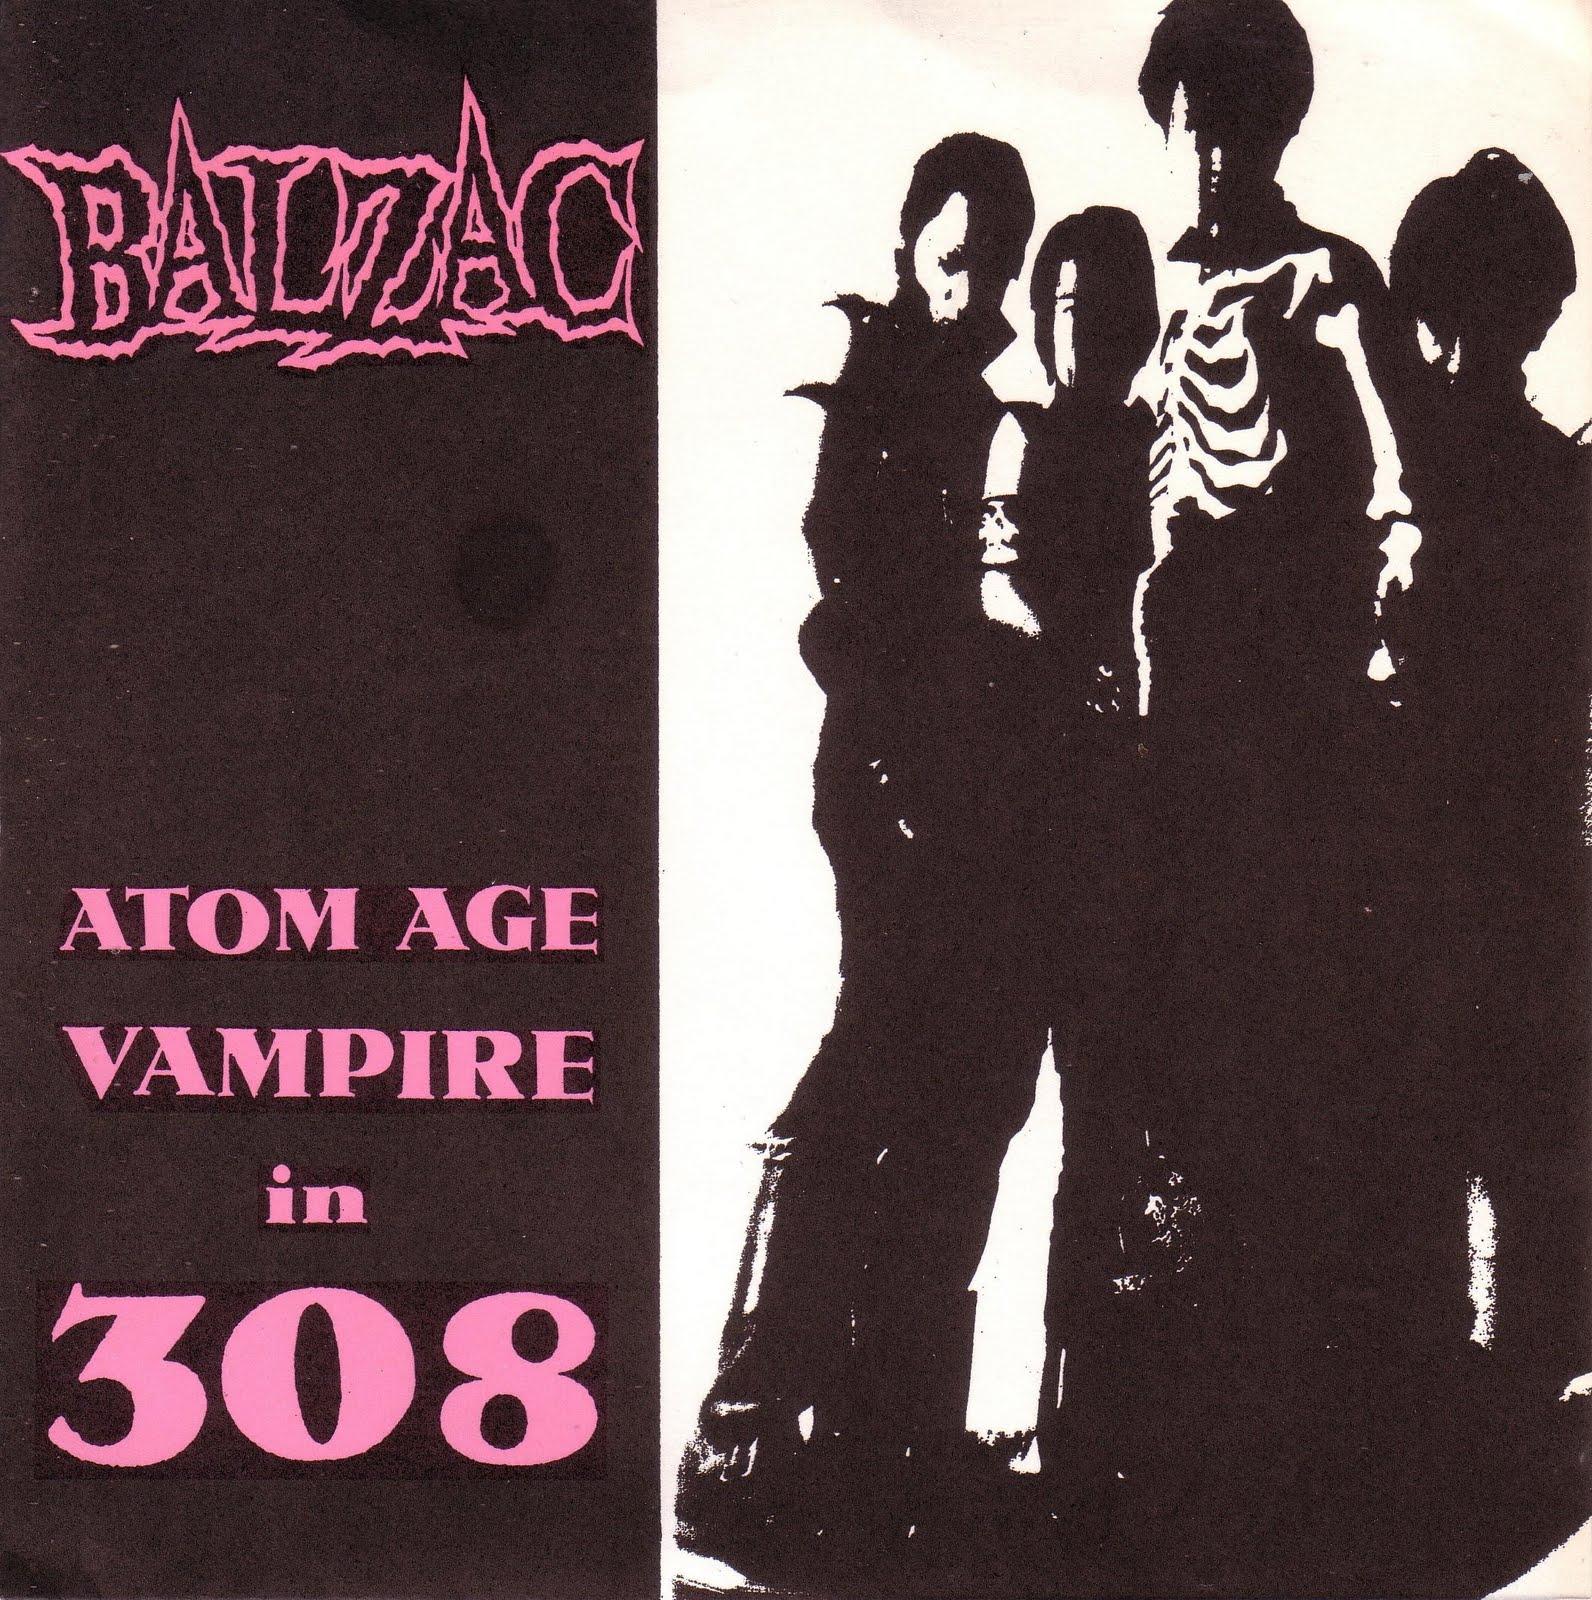 balzac-atom_age_vampire_in_308_pictures